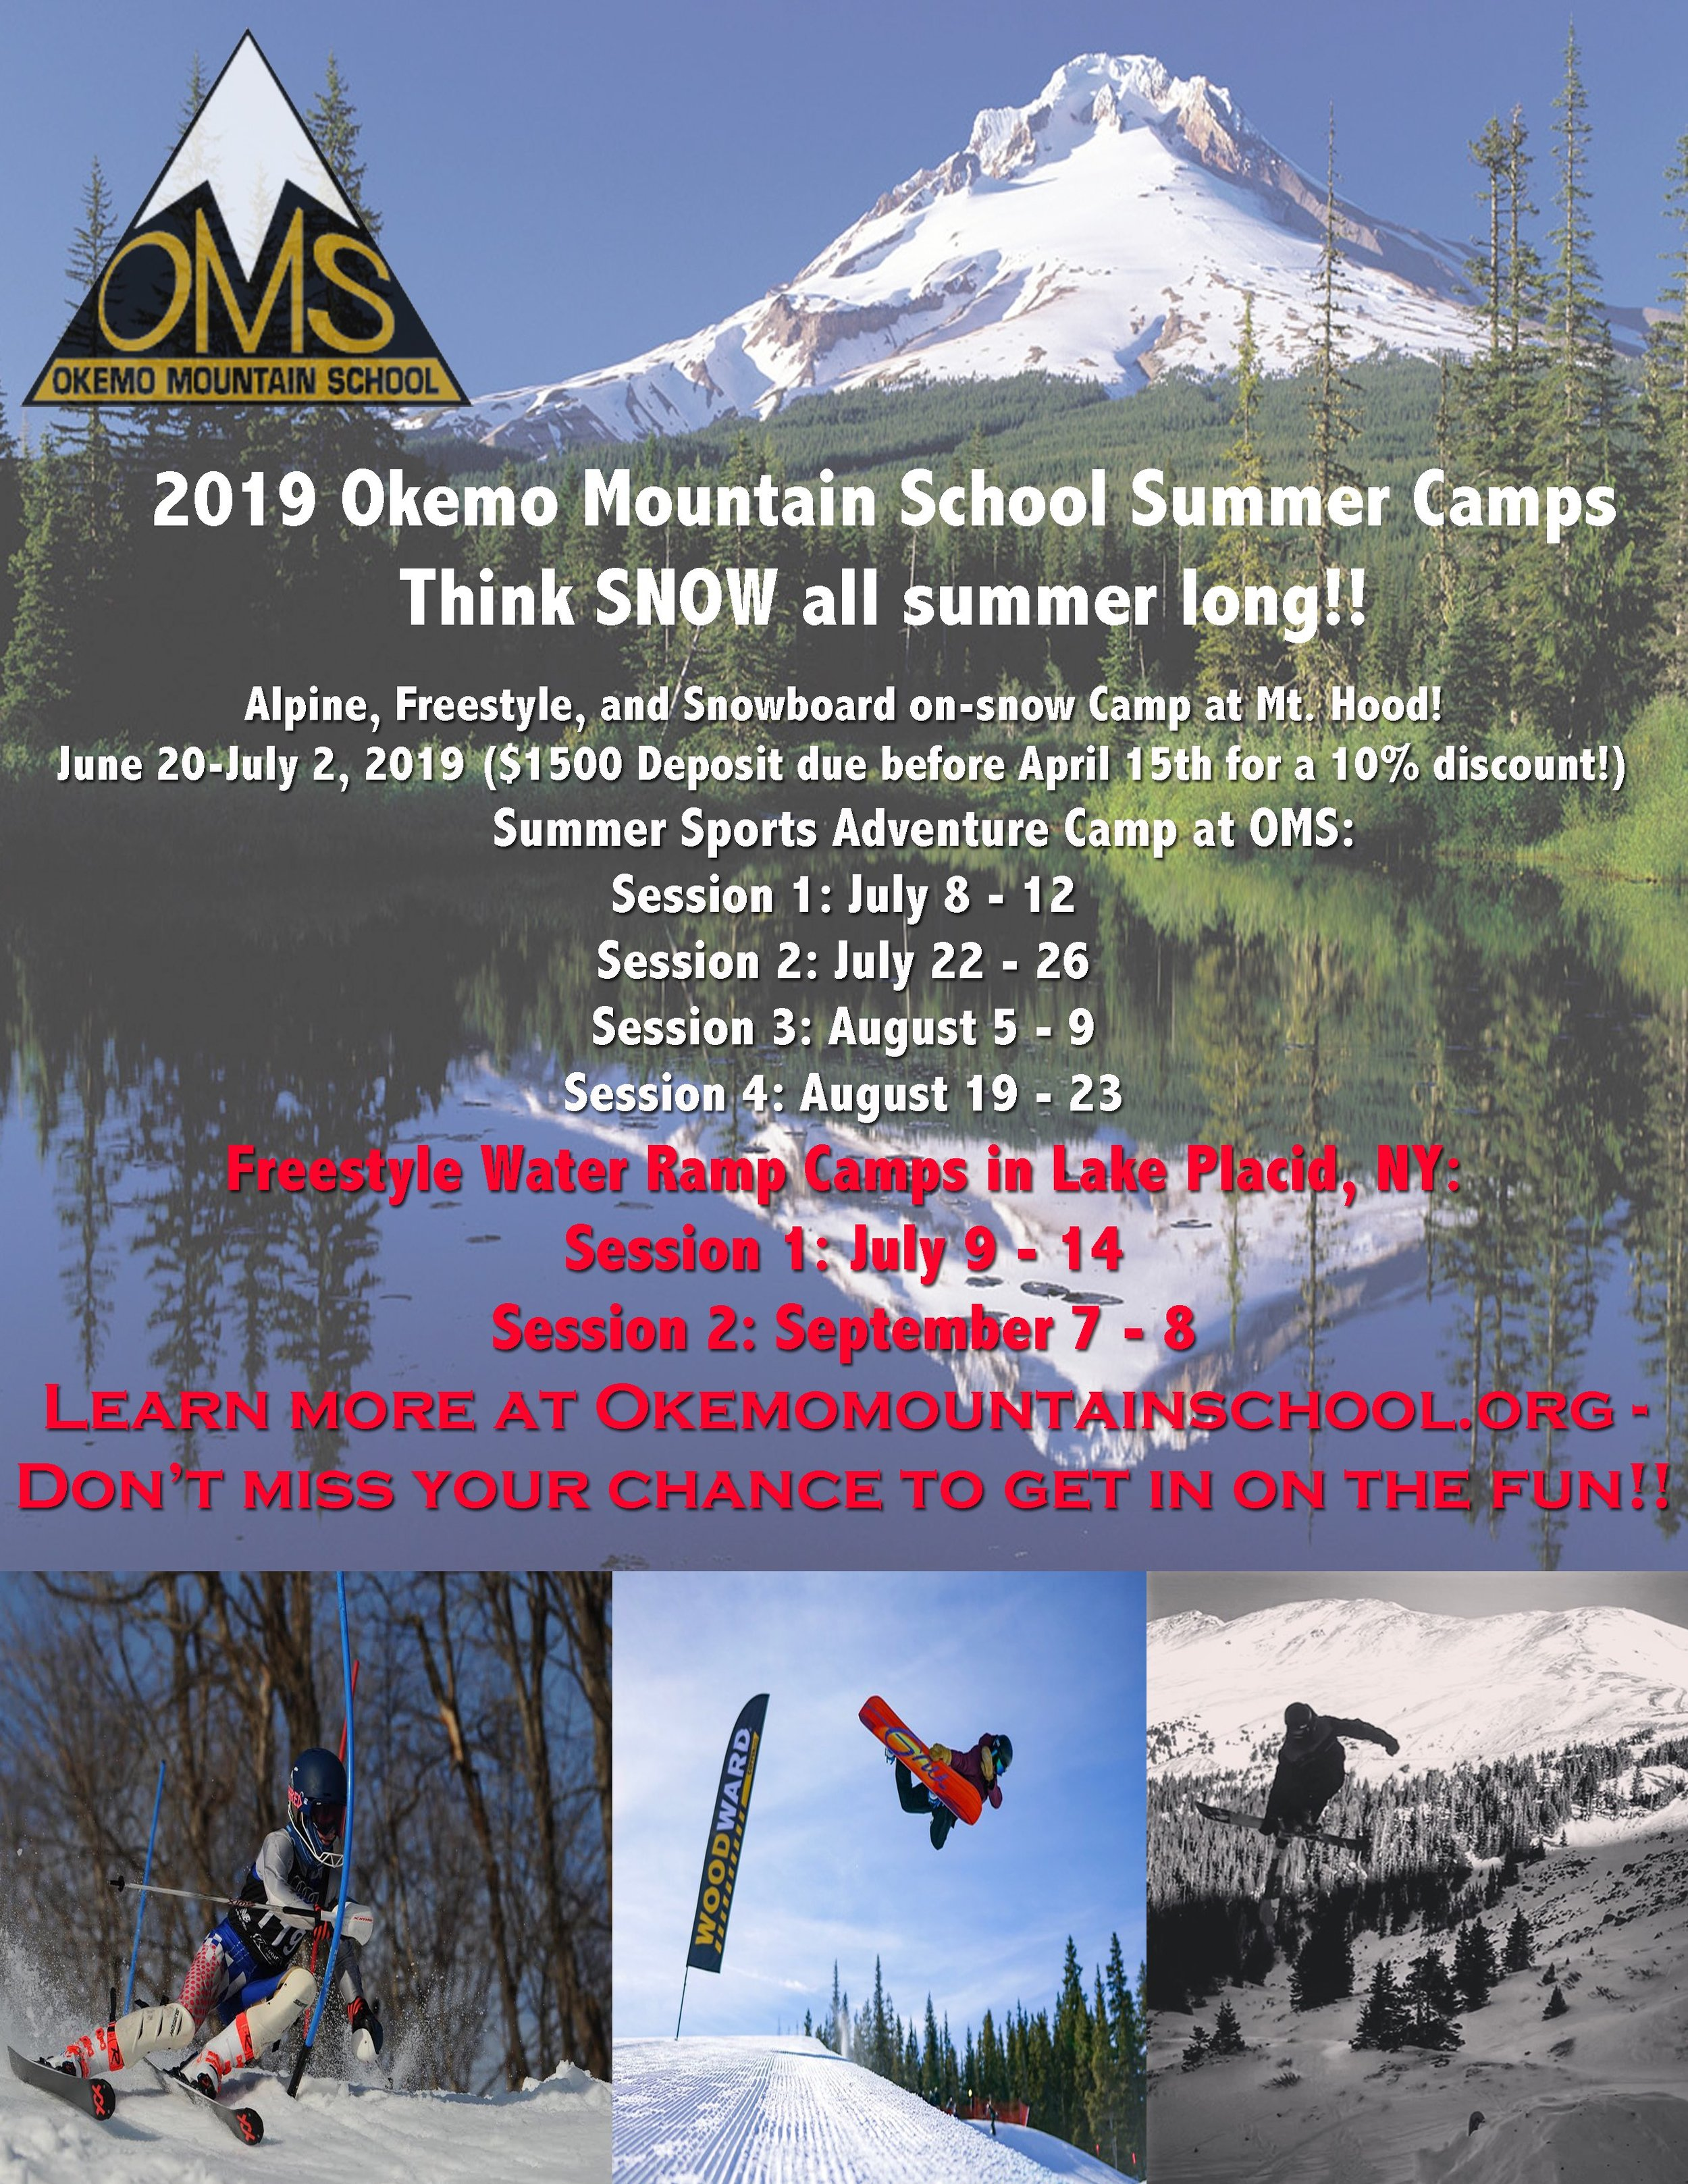 OMS 2019 Summer Camps .jpg